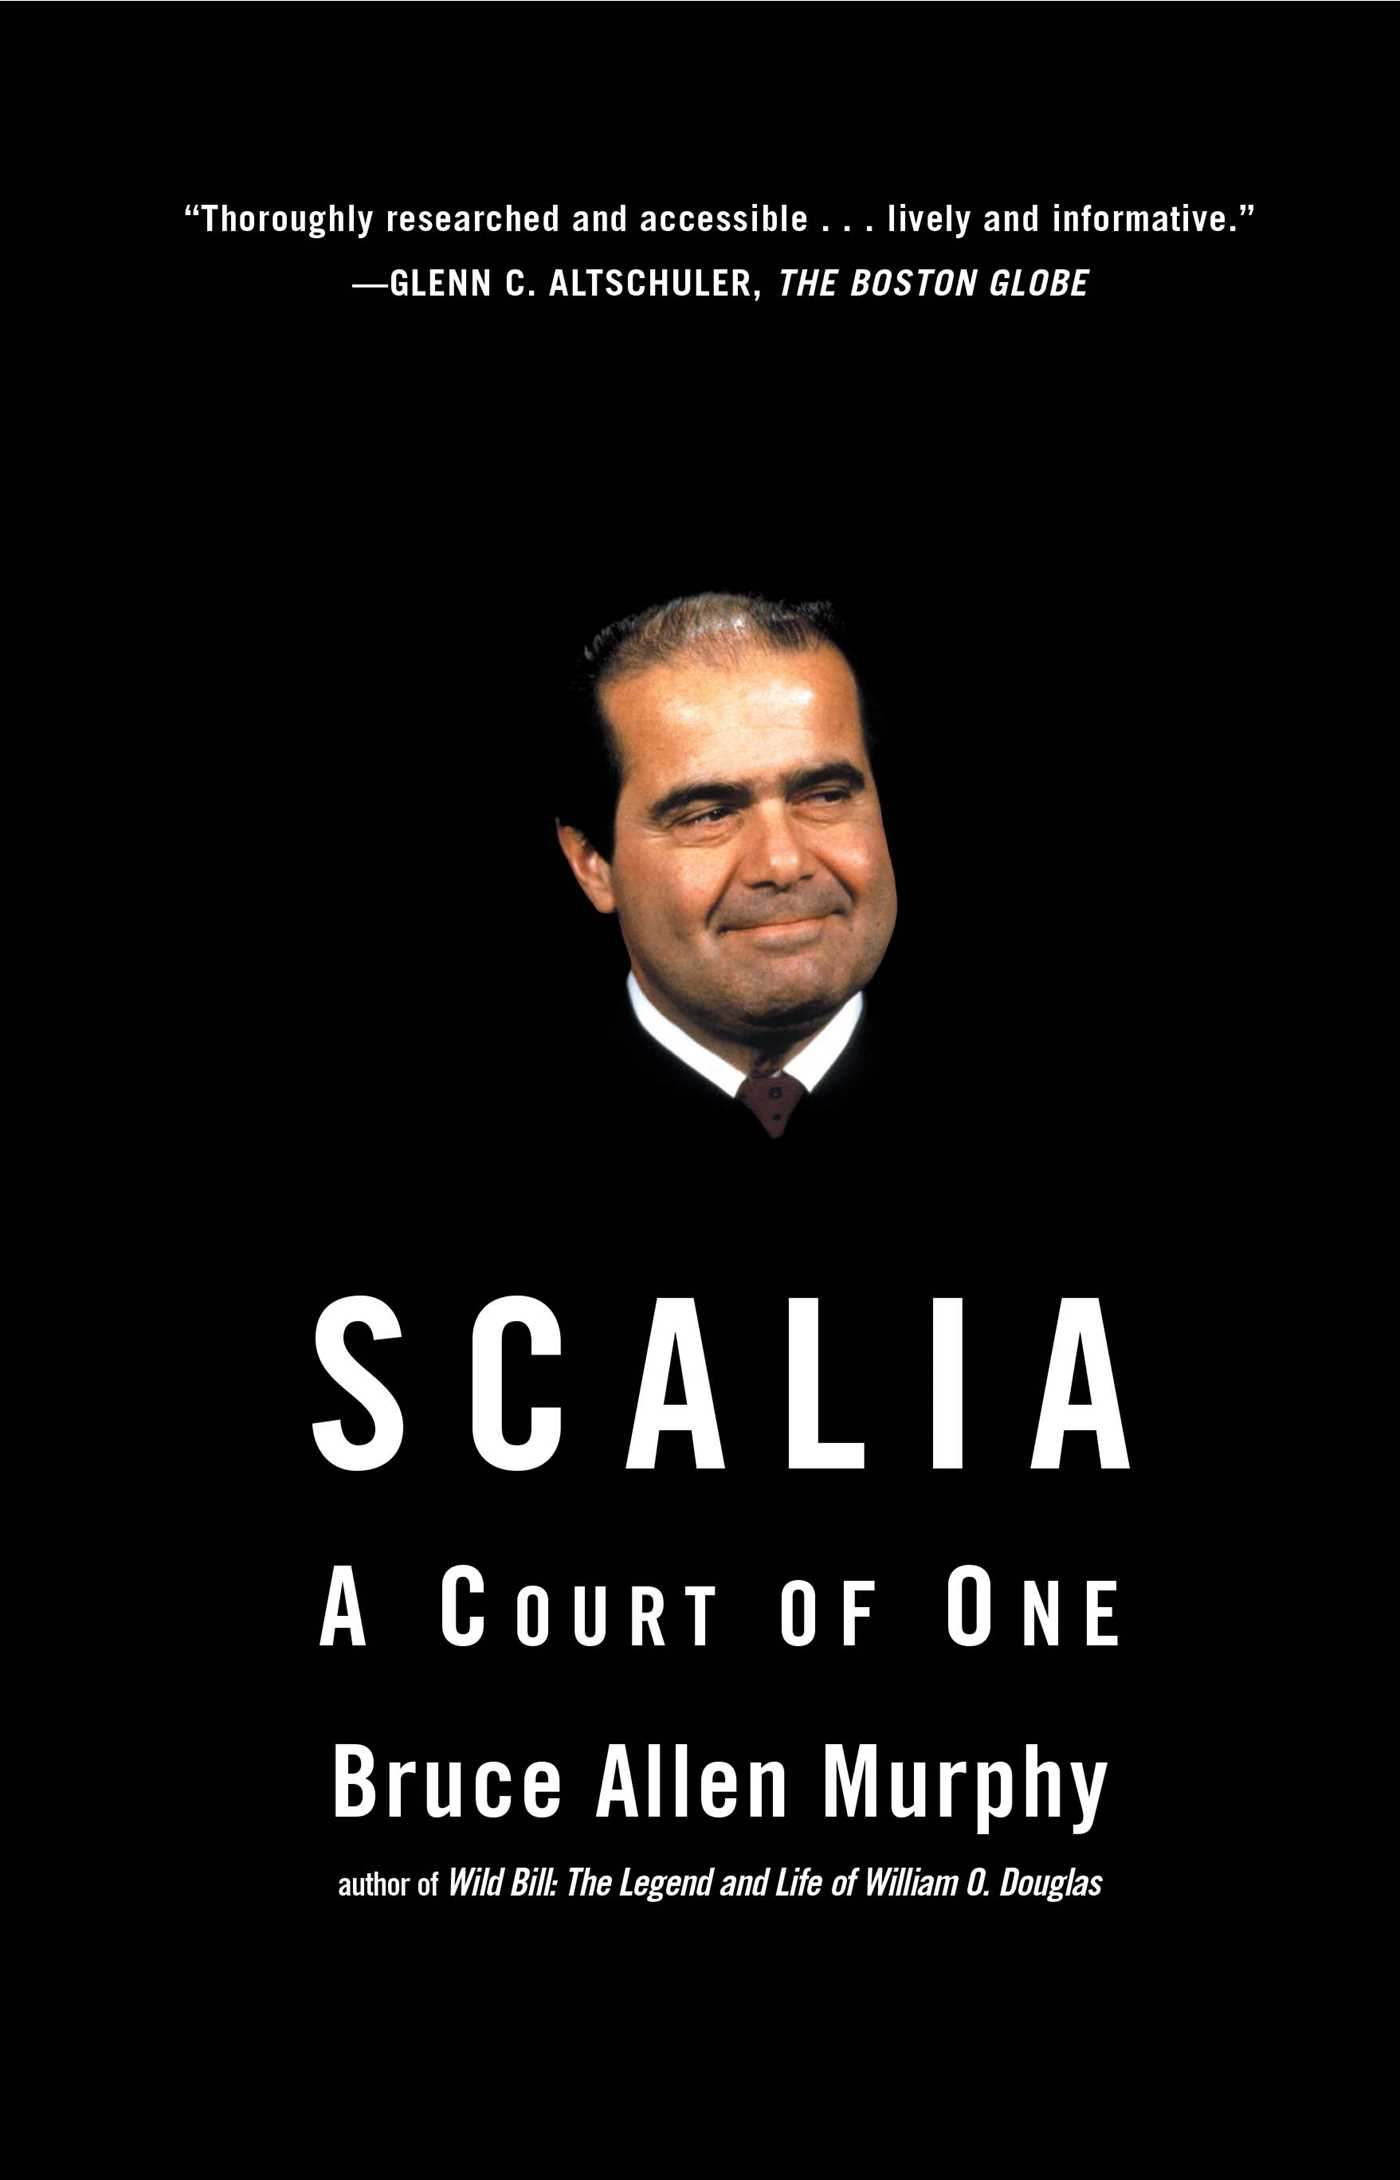 Scalia 9780743296502 hr